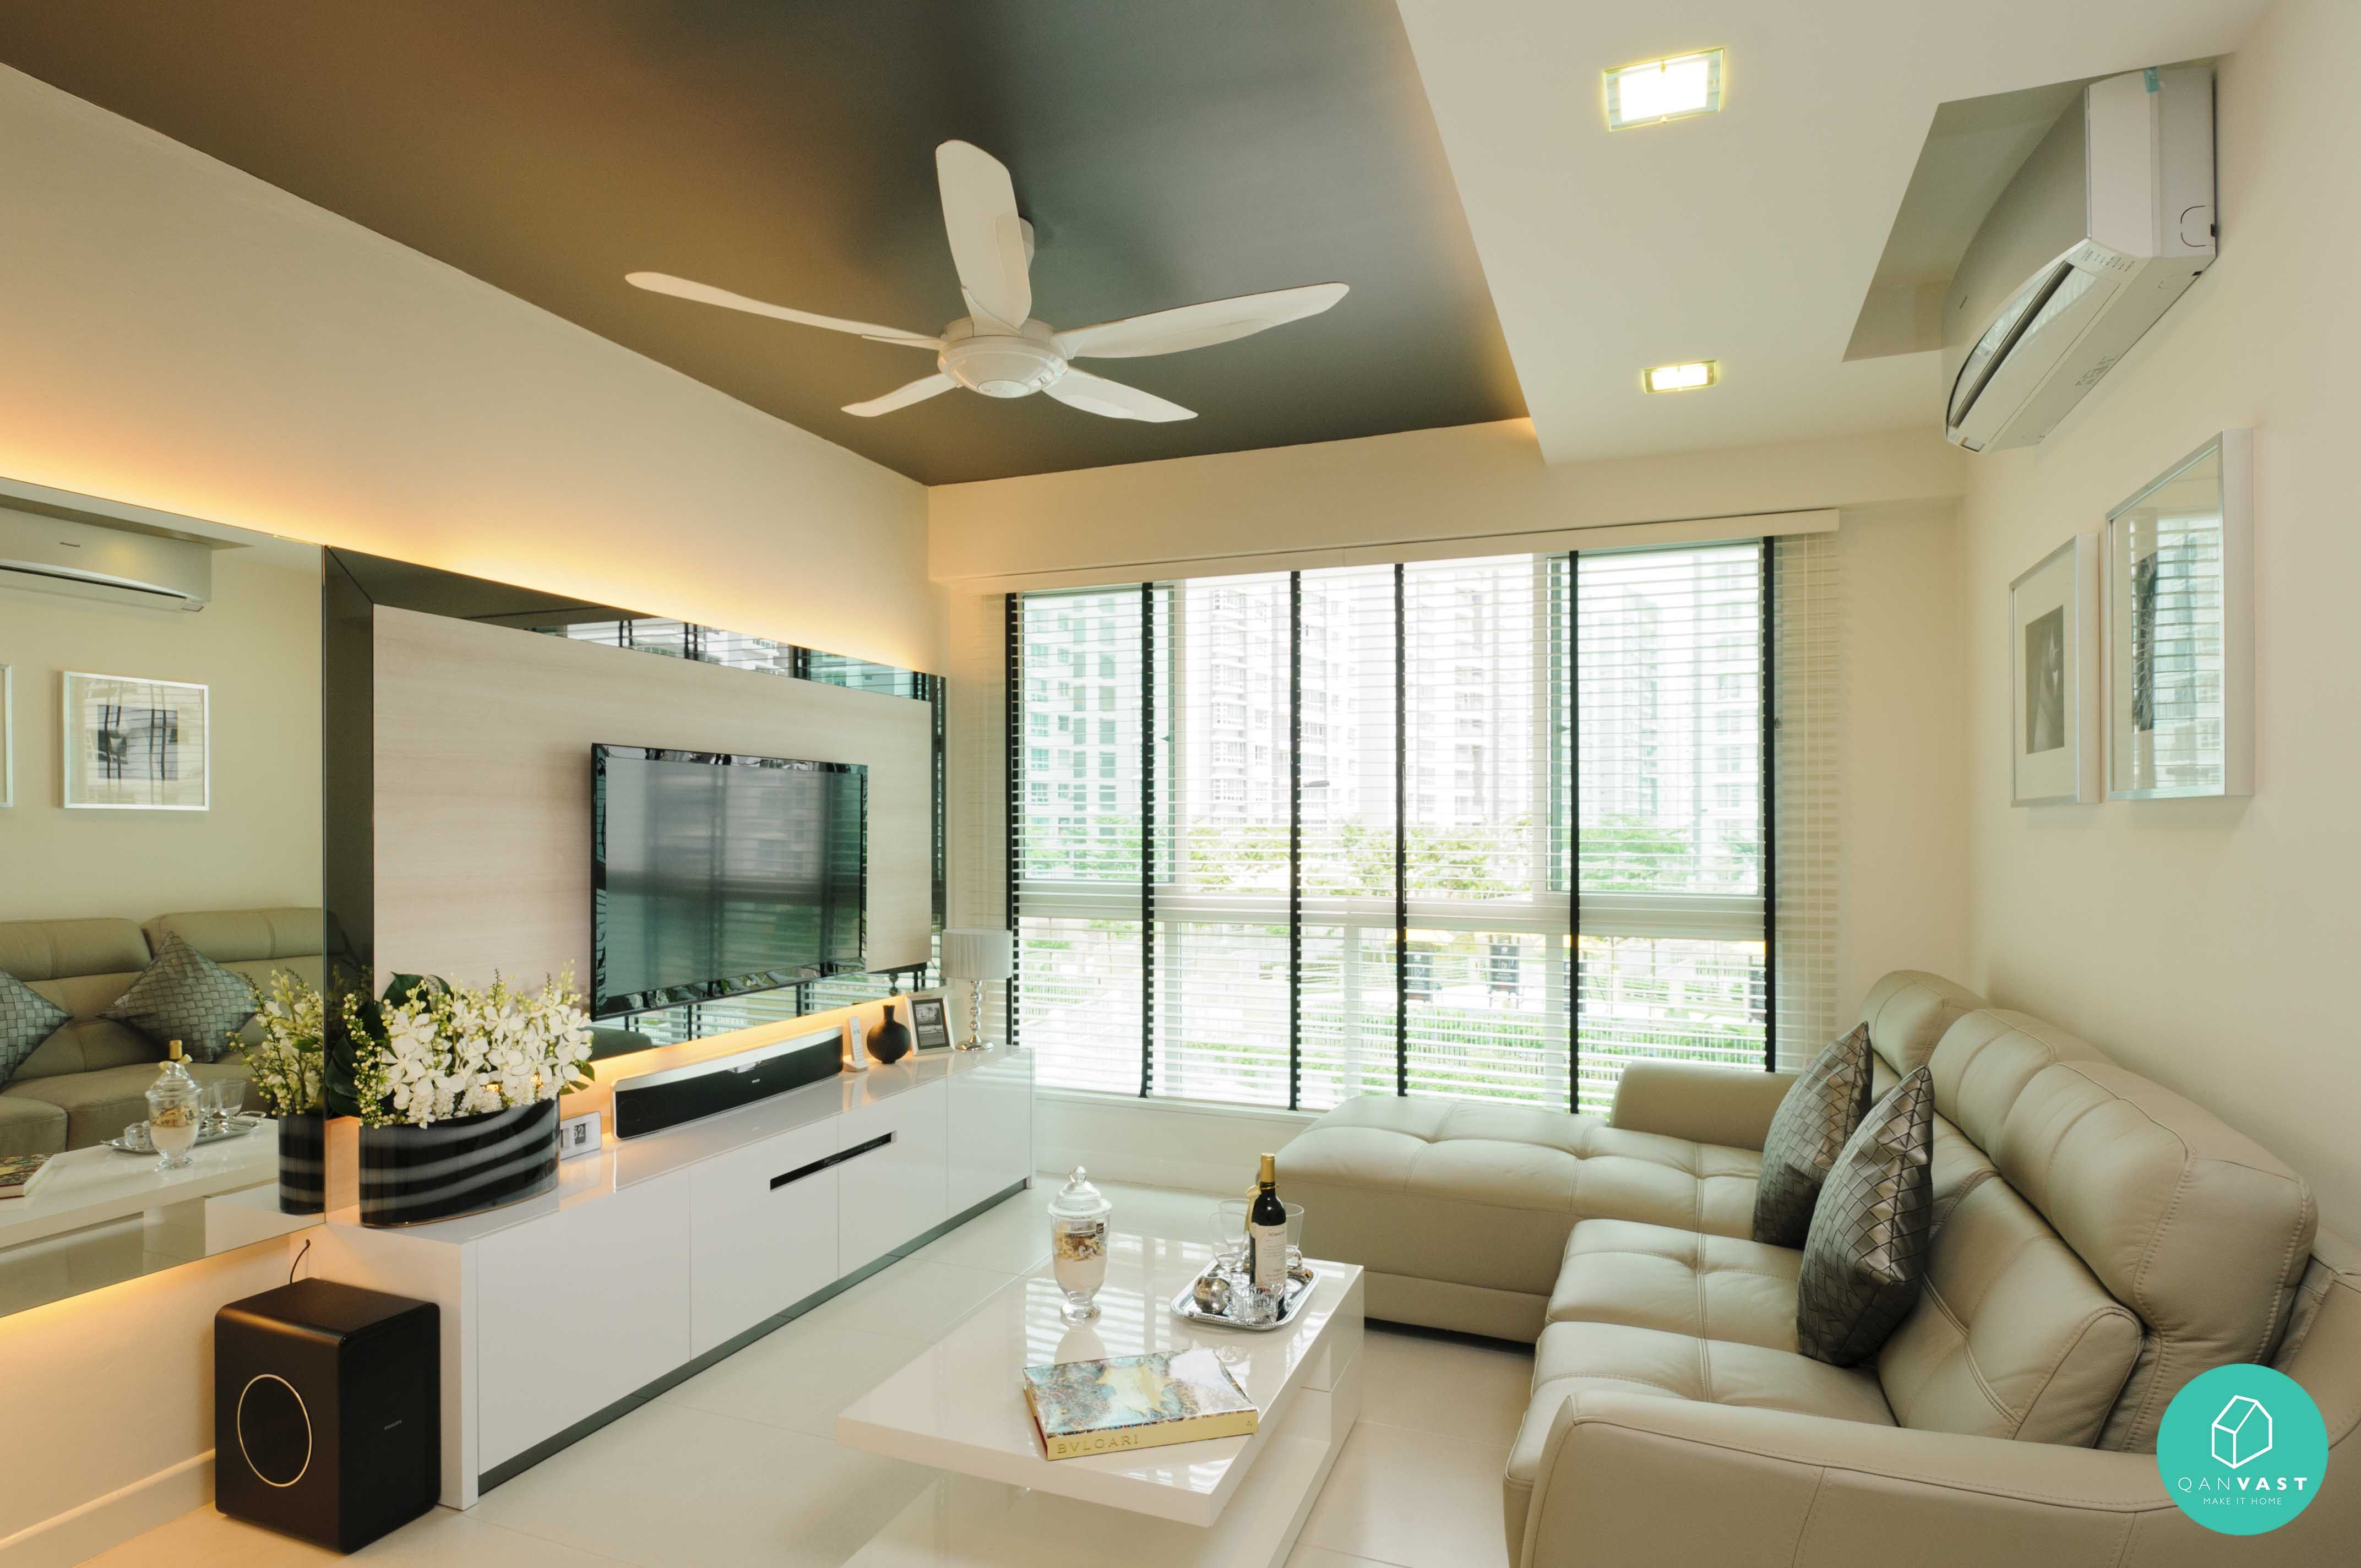 Your Dream Home For Under 25 000 Interior Design Living Room Bedroom False Ceiling Design Living Room Designs